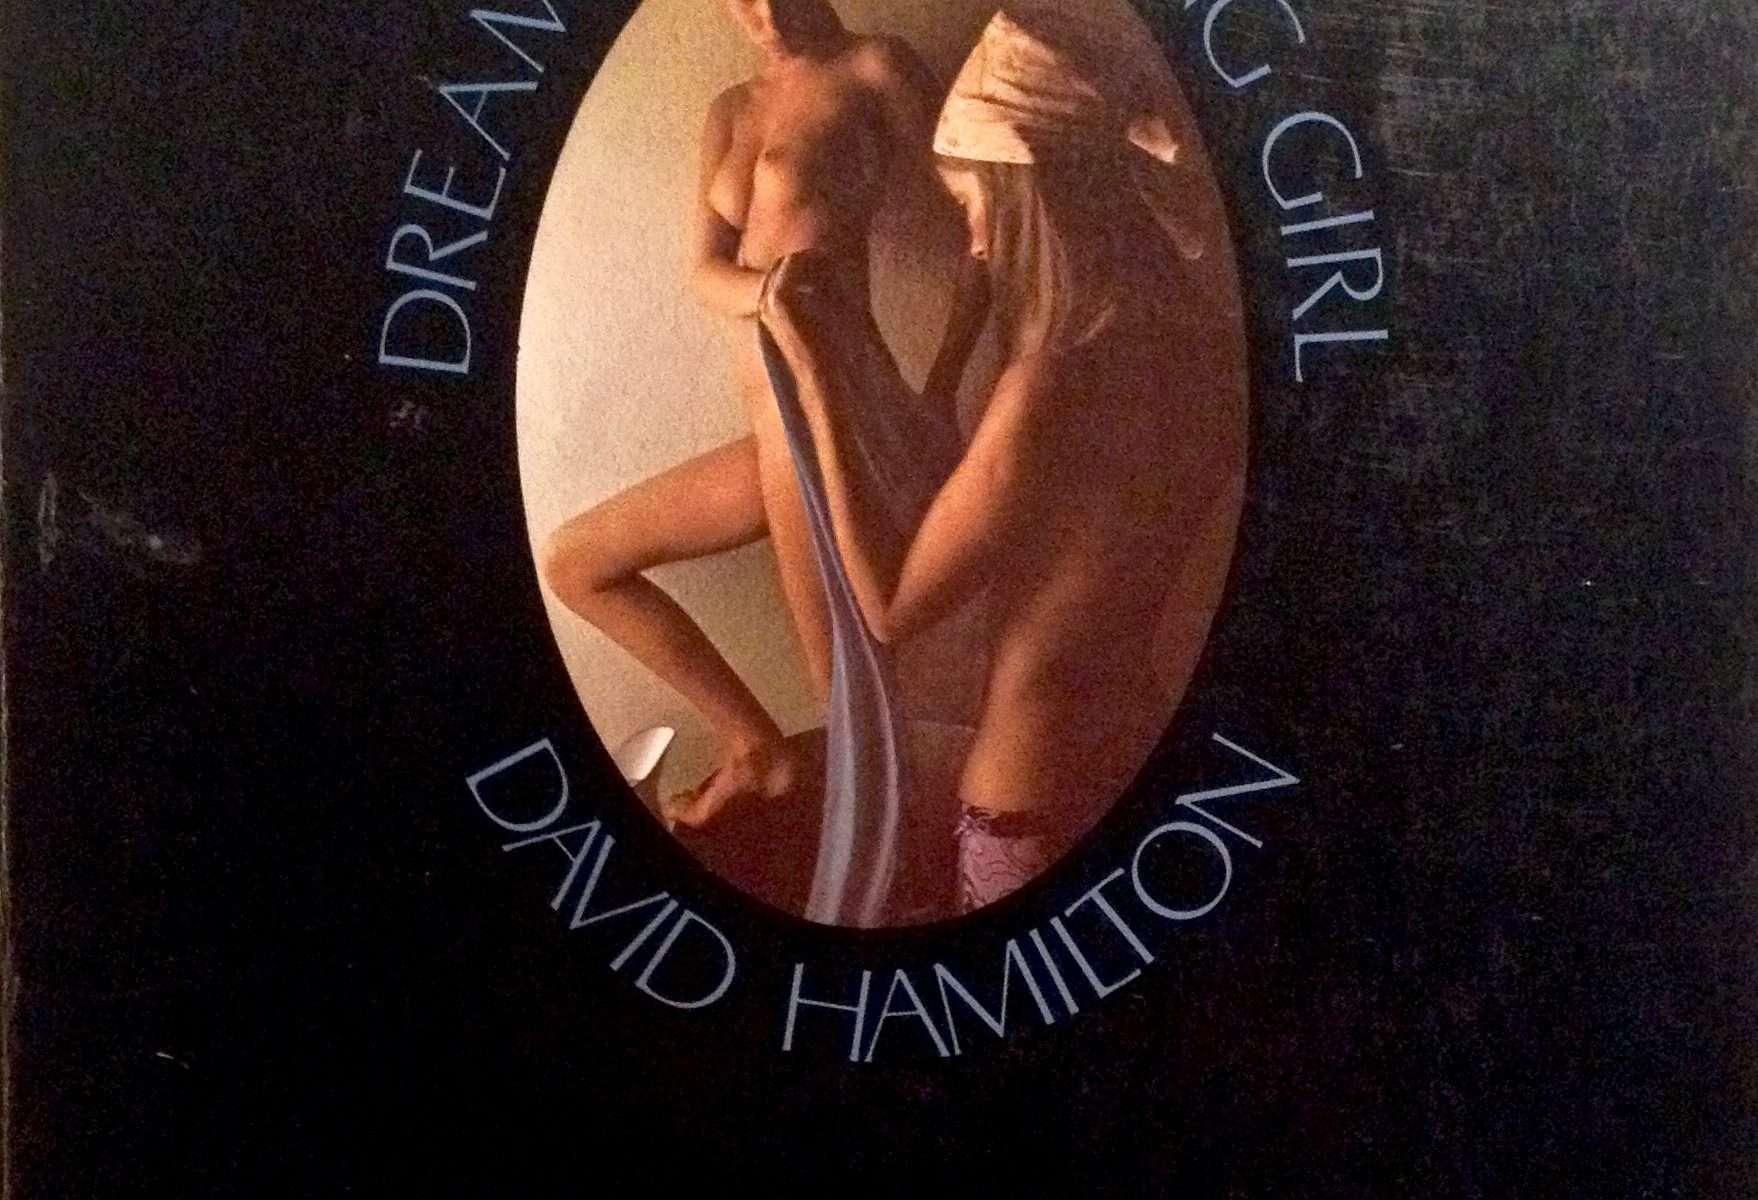 DREAMS OF A YOUNG GIRL <BR/> David Hamilton - Alain Robbe-Grillet